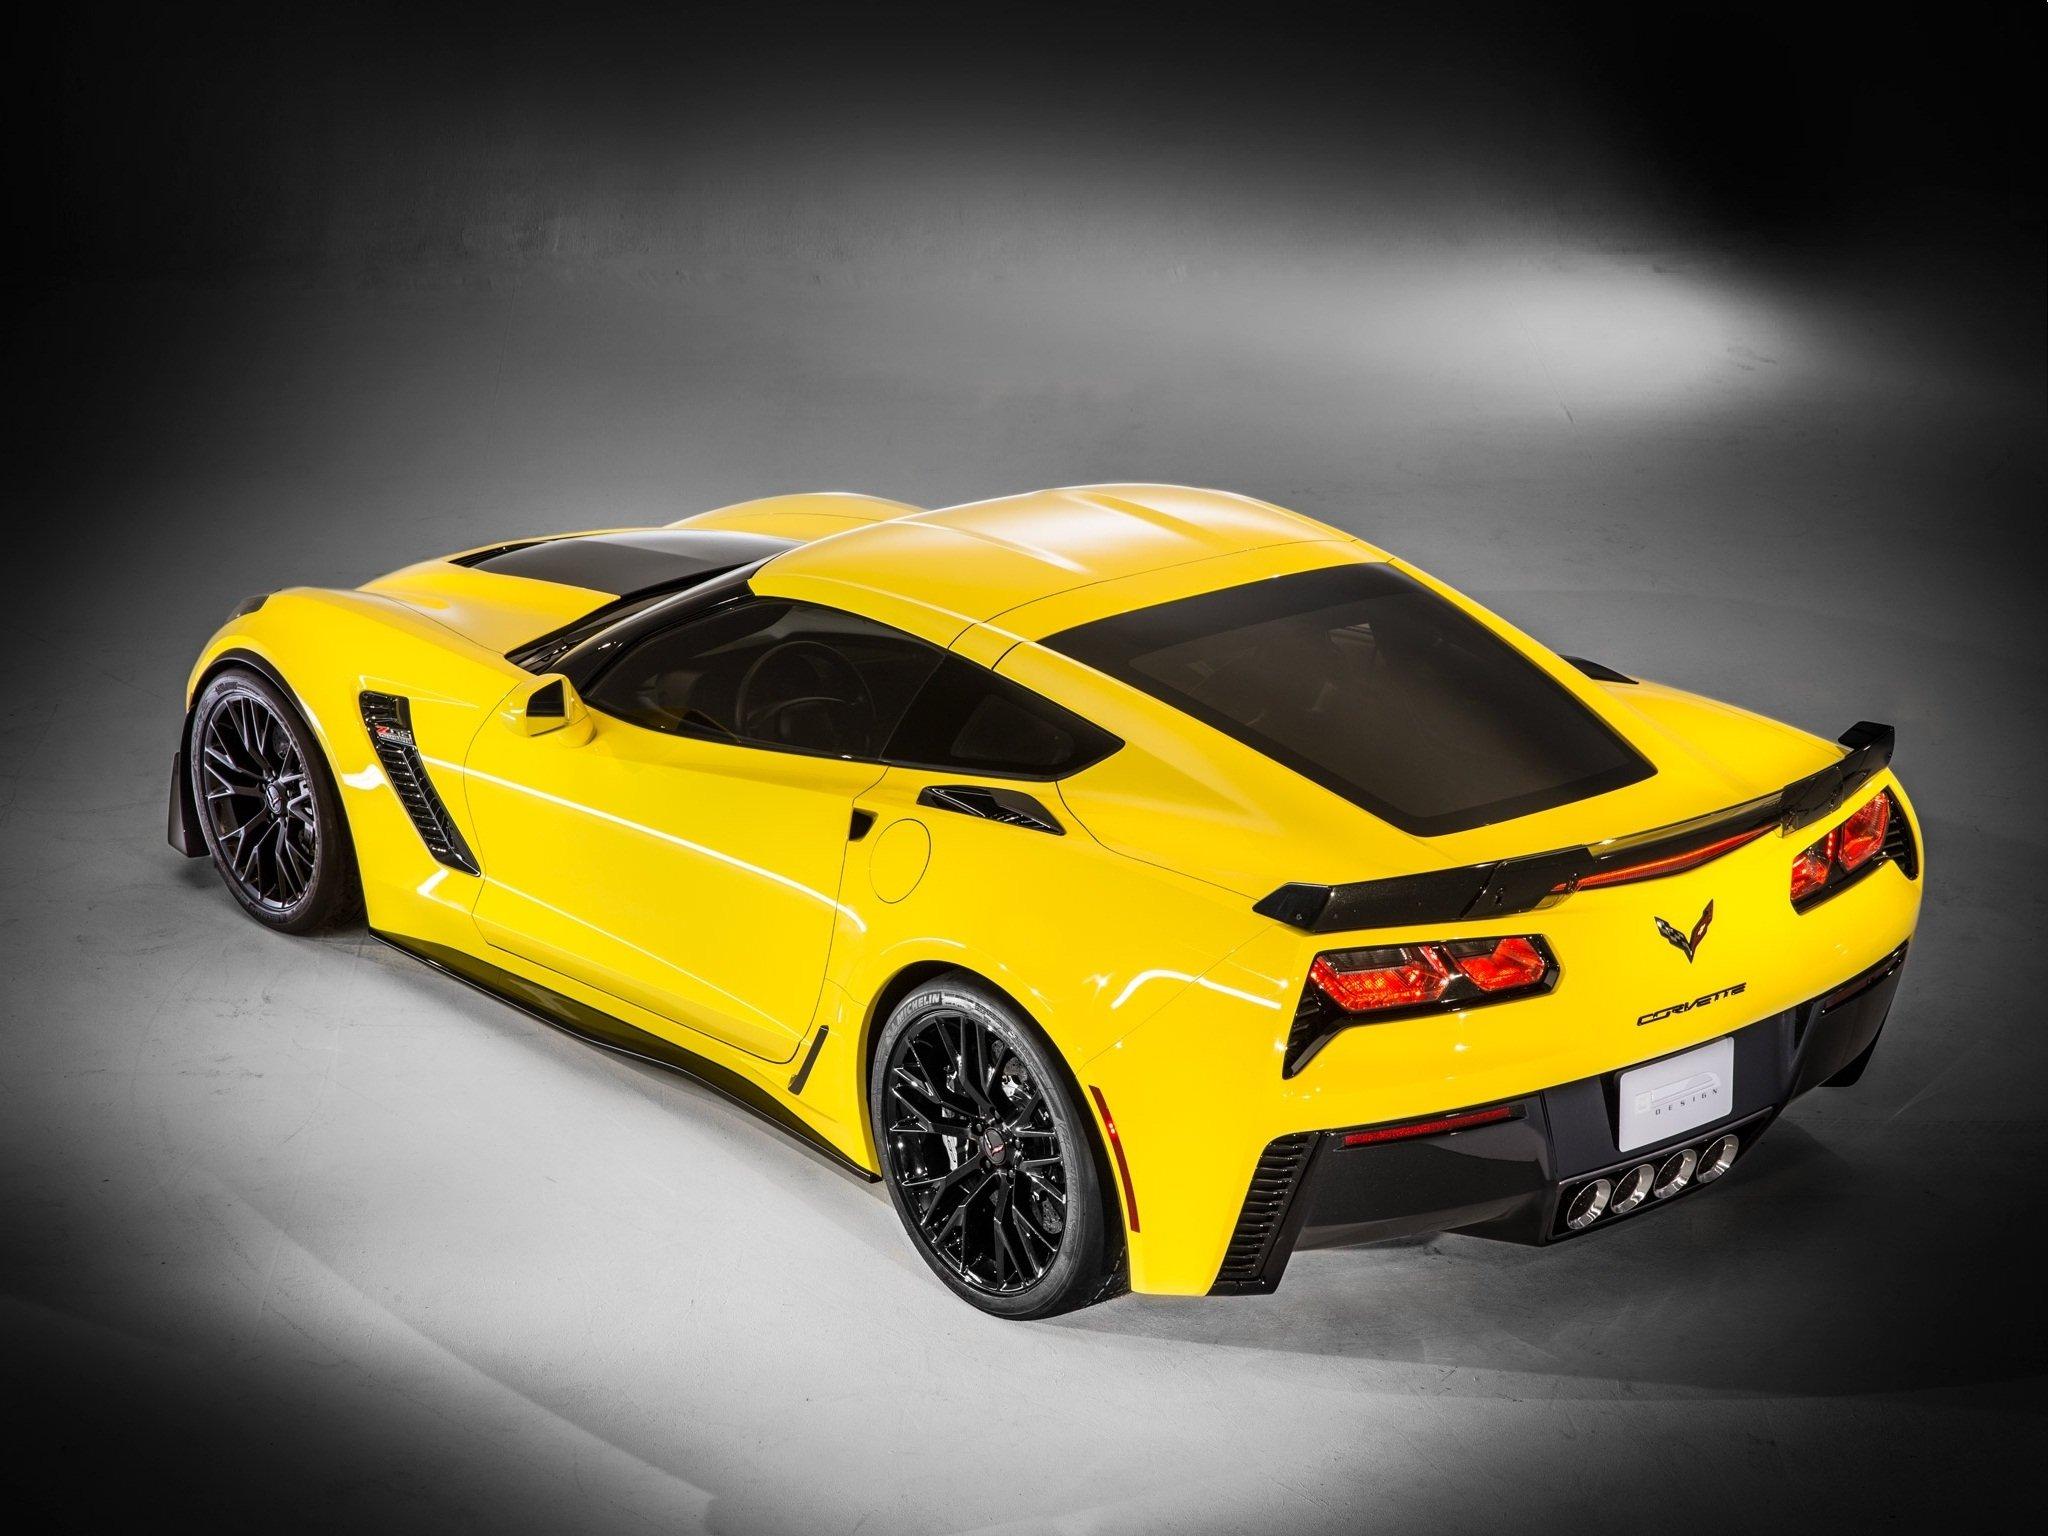 2014 chevrolet corvette stingray z06 c 7 supercar muscle g wallpaper. Cars Review. Best American Auto & Cars Review